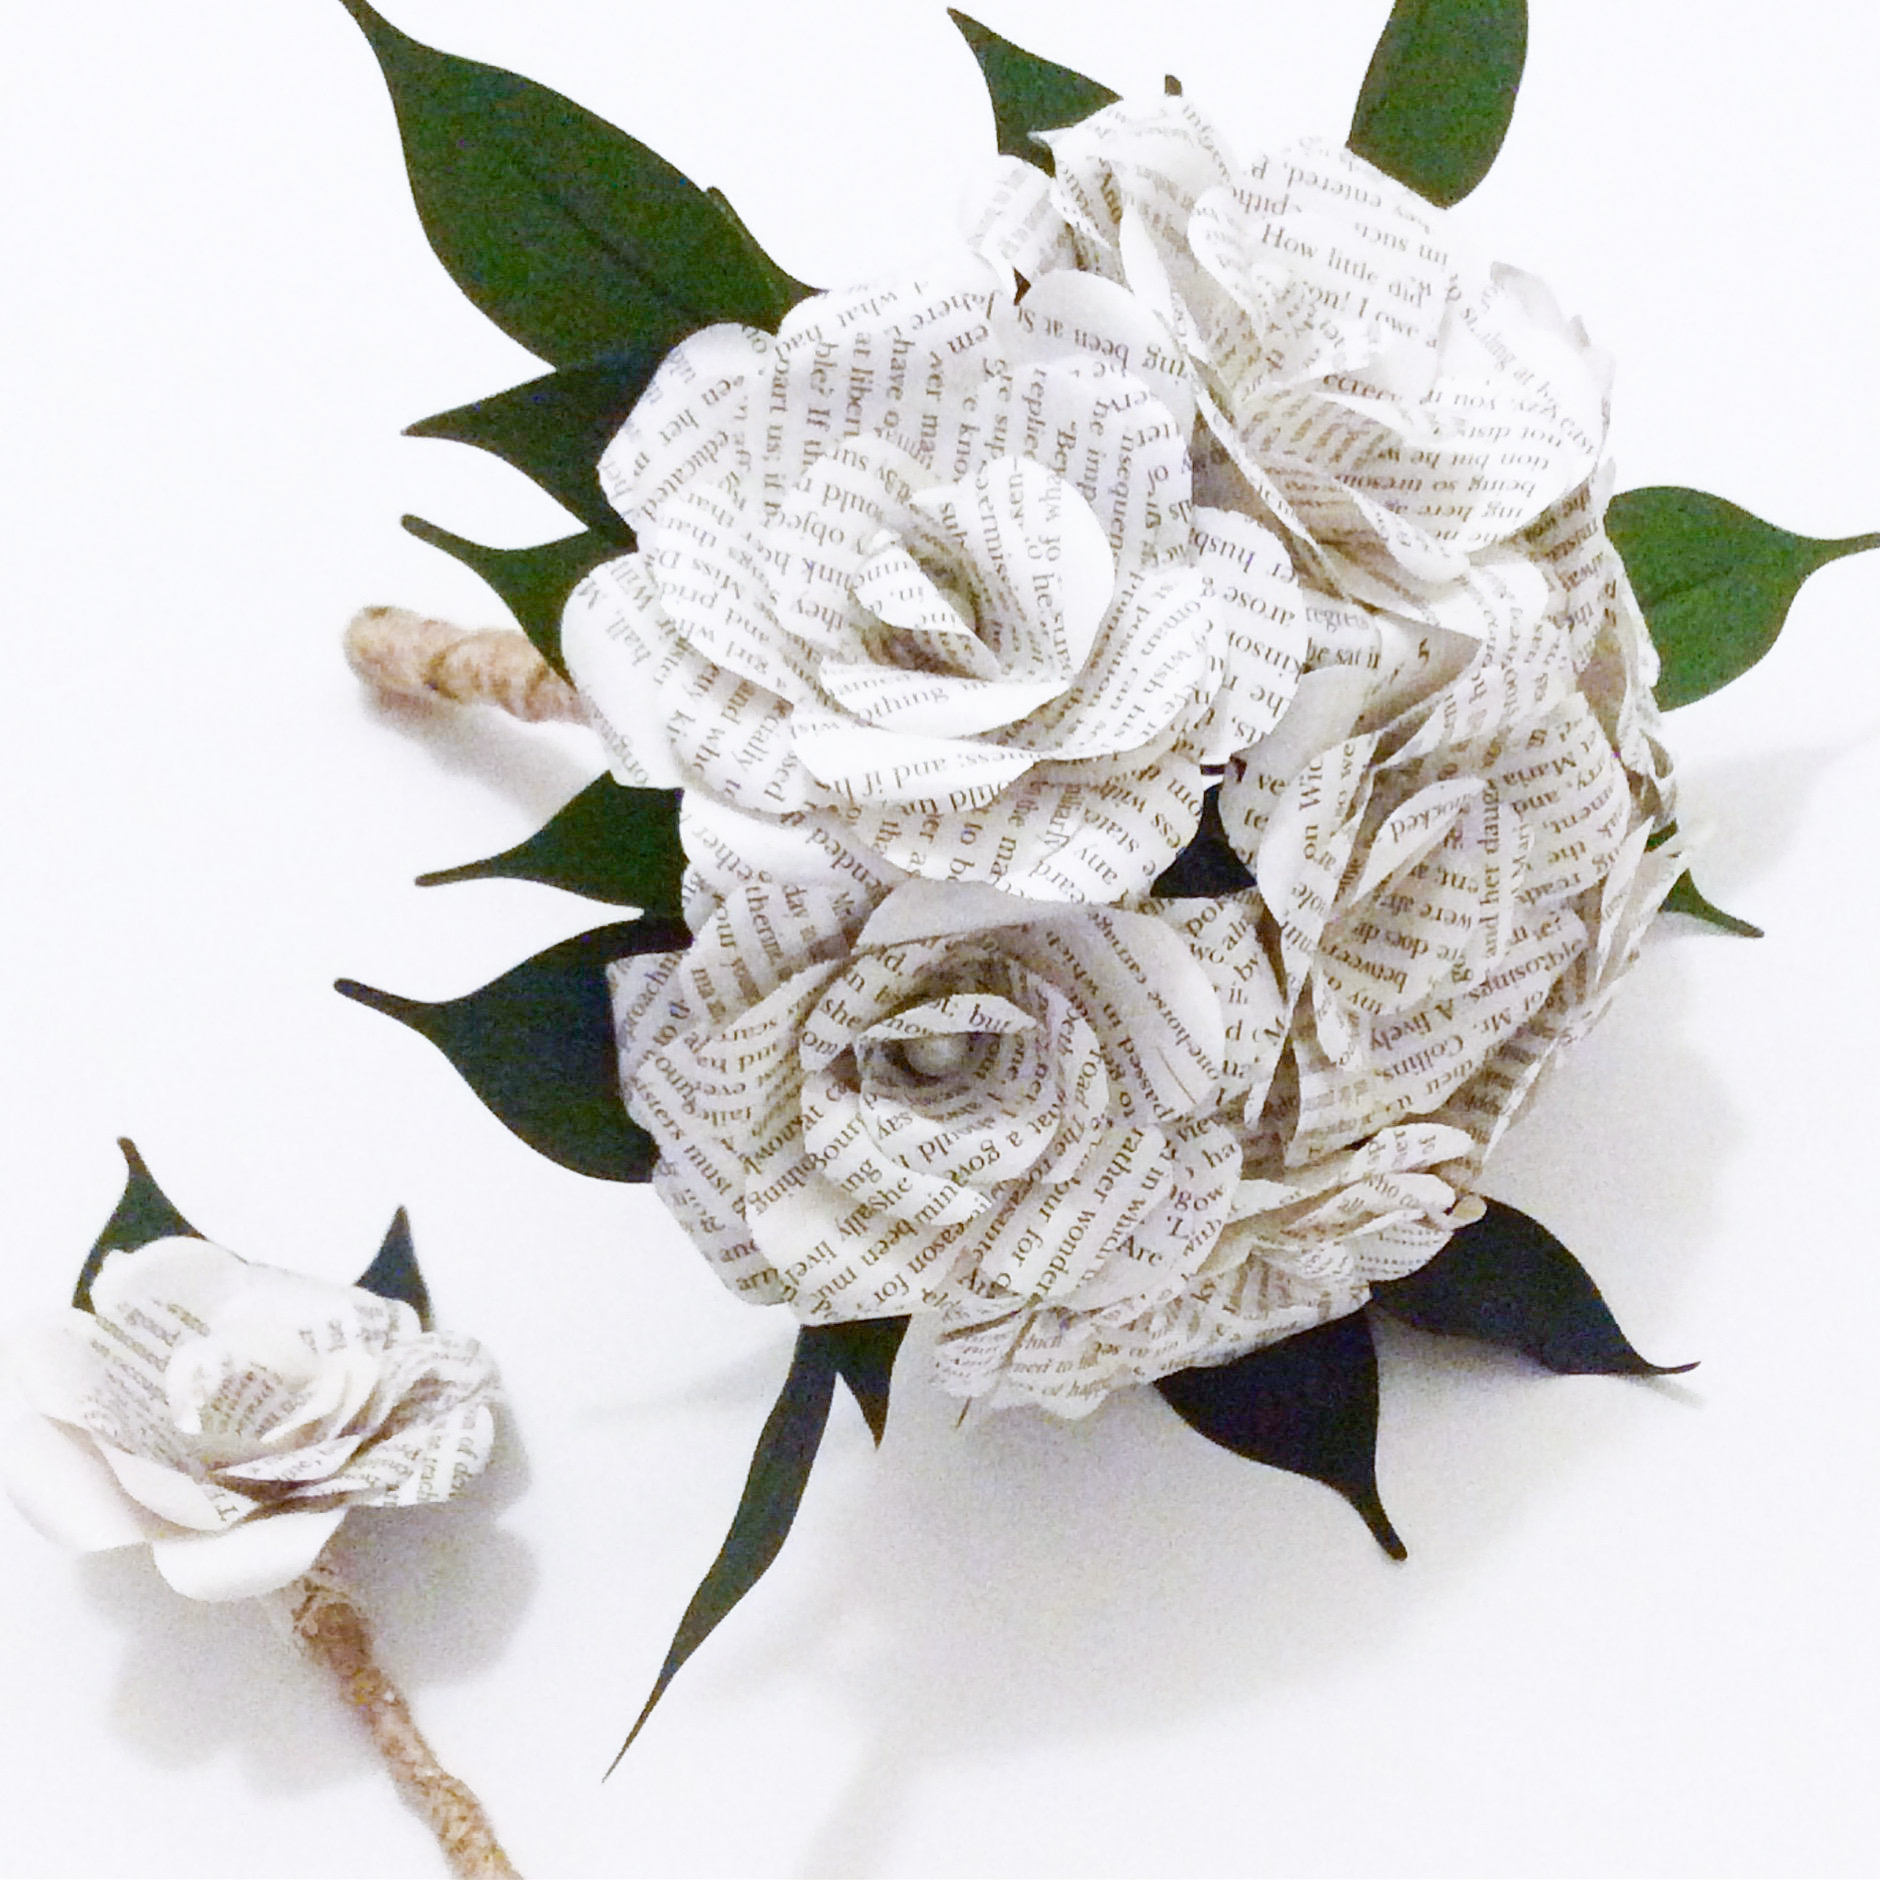 Harry Potter Bouquet Custom Book Bouquet Weddingbook Flowers